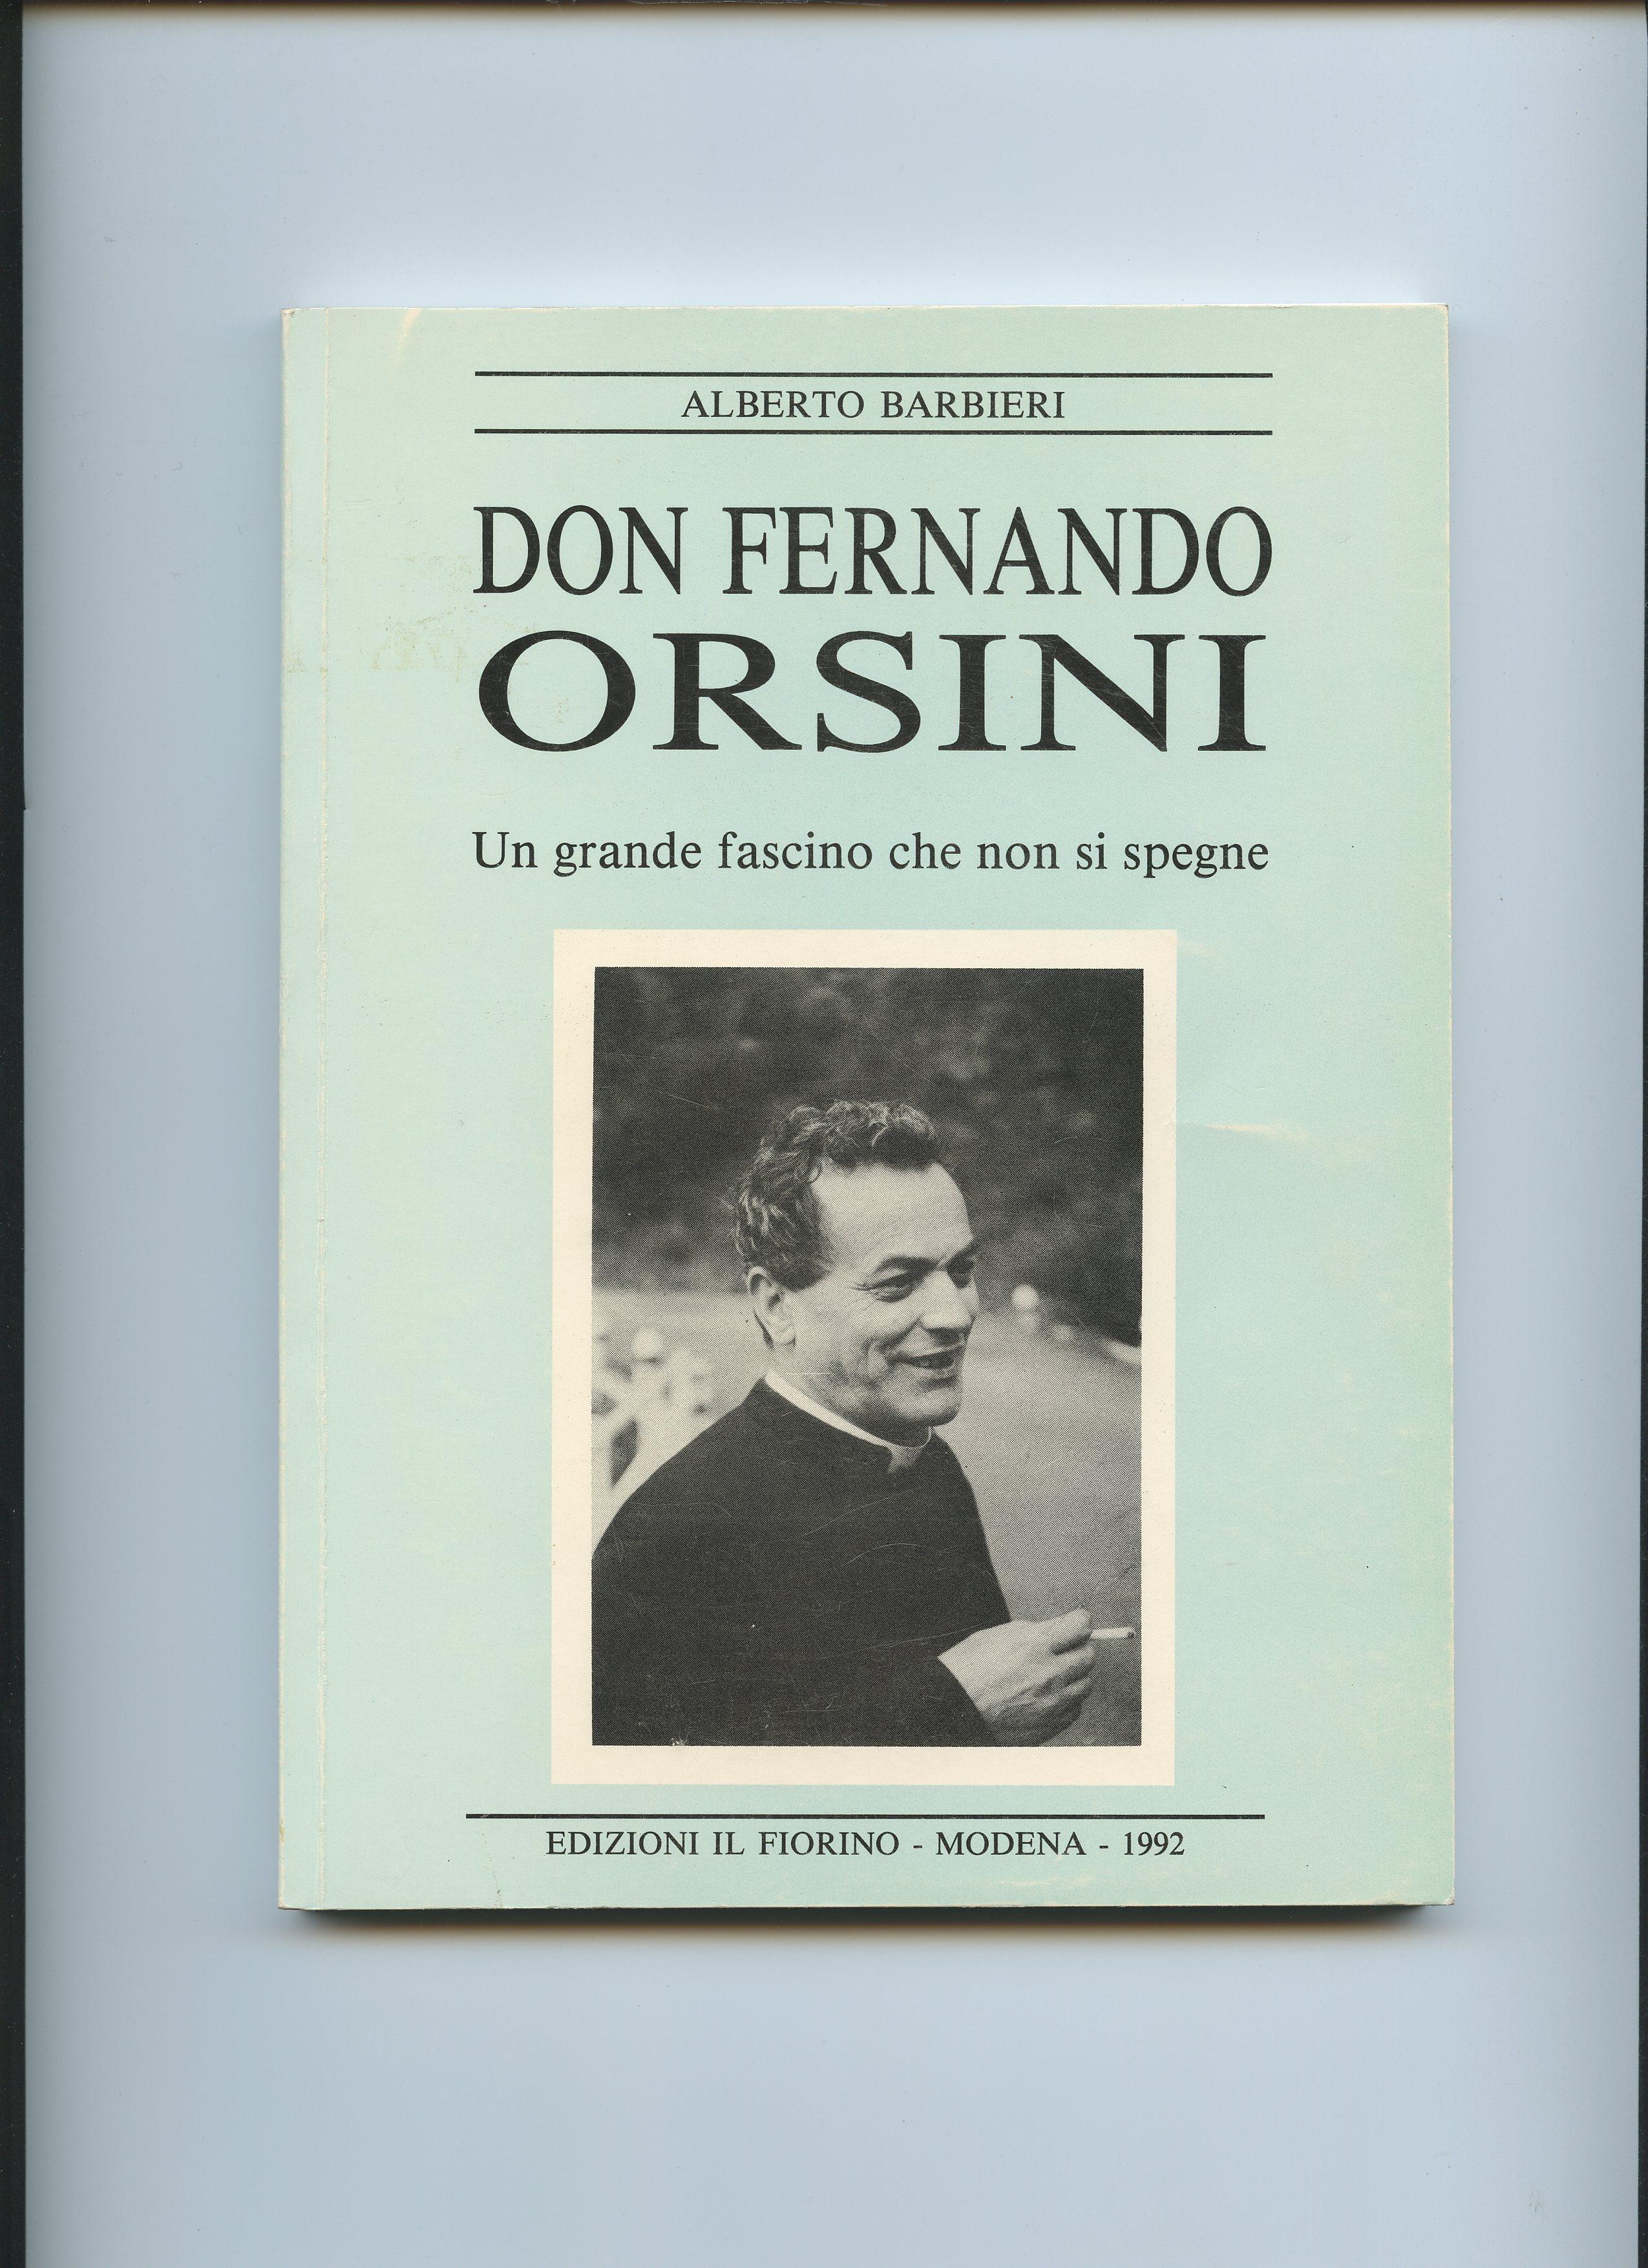 Don Fernando Orsini